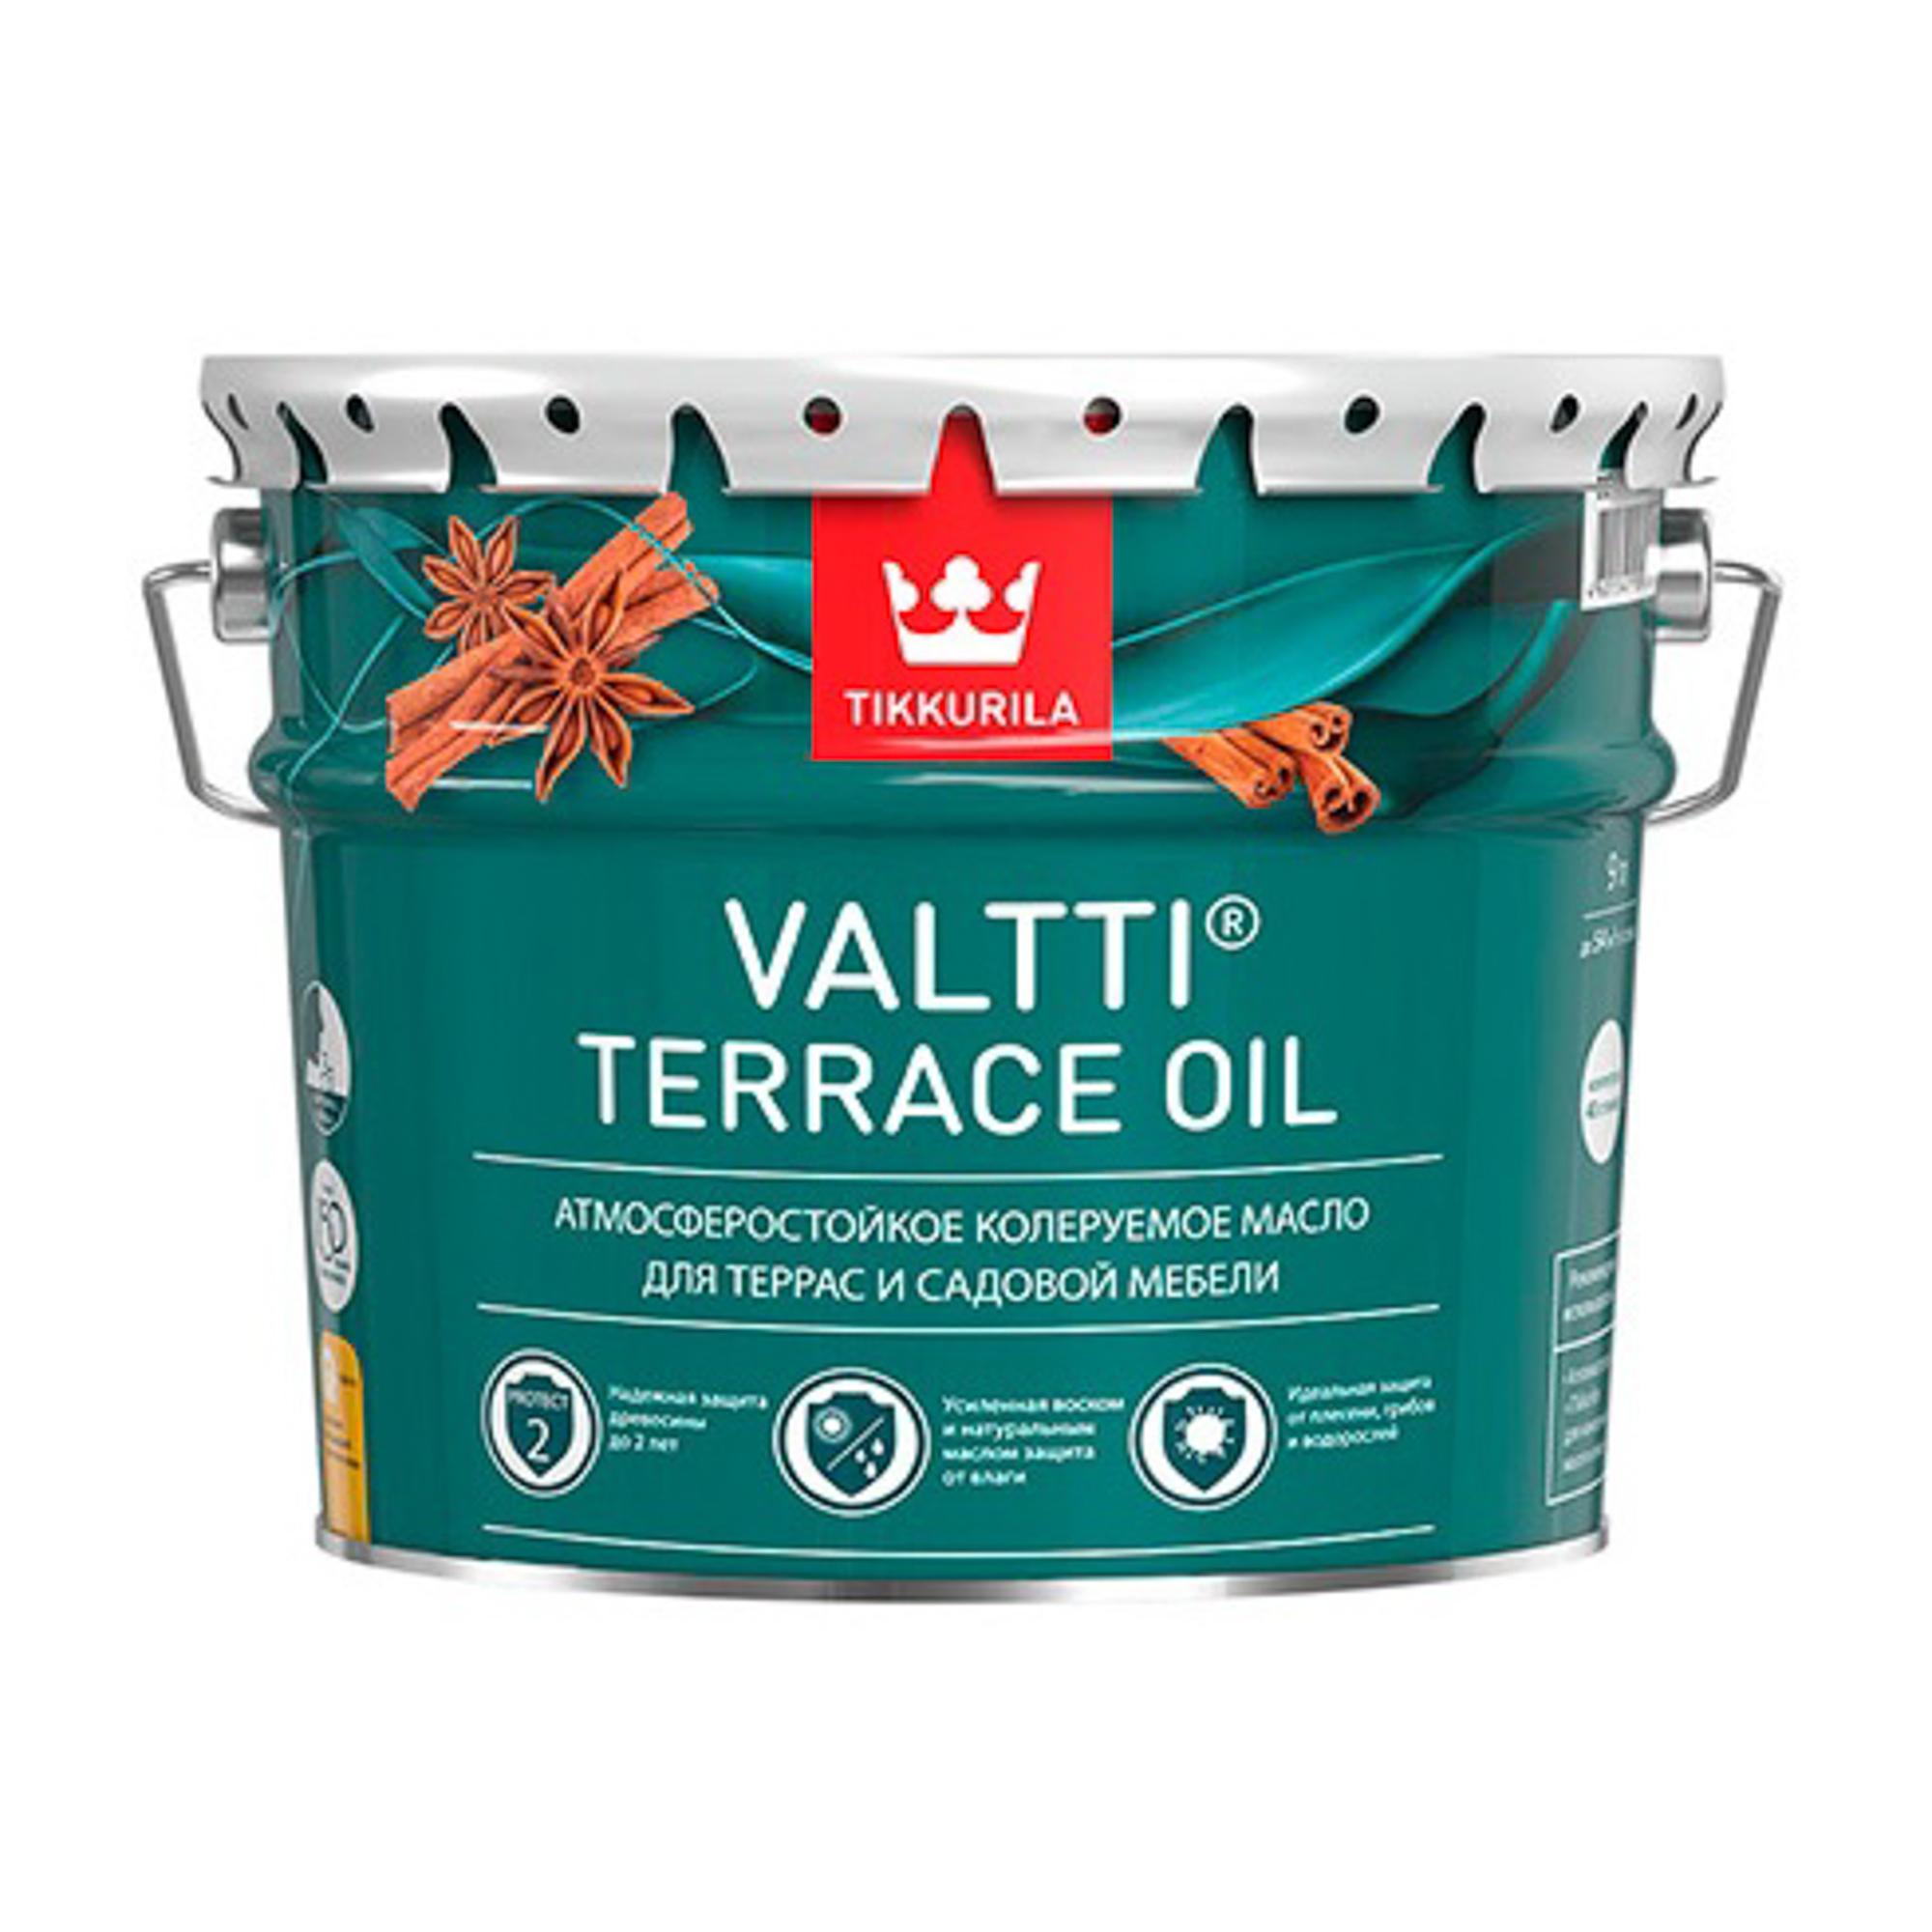 Масло tikkurila valtti terrace oil ec 9 л.